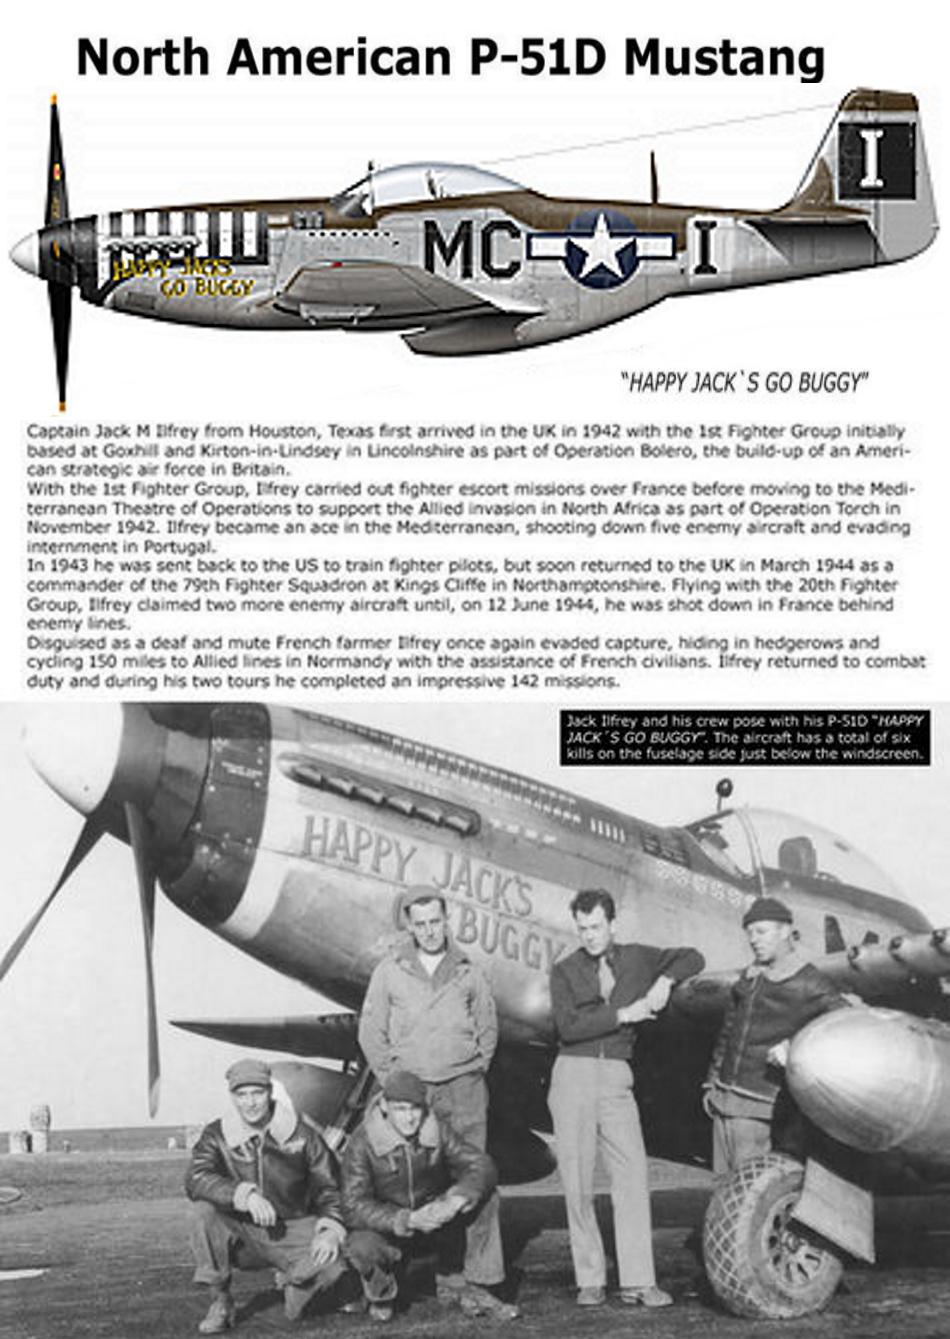 NORTH AMERICAN P-51 MUSTANG P51d-315